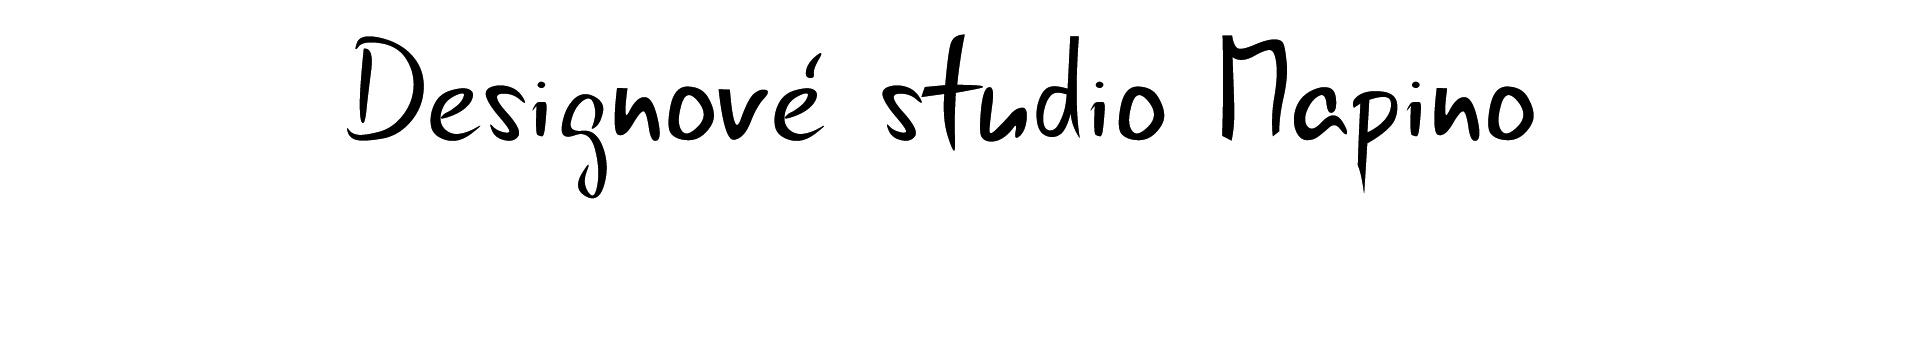 Designové studio mapino